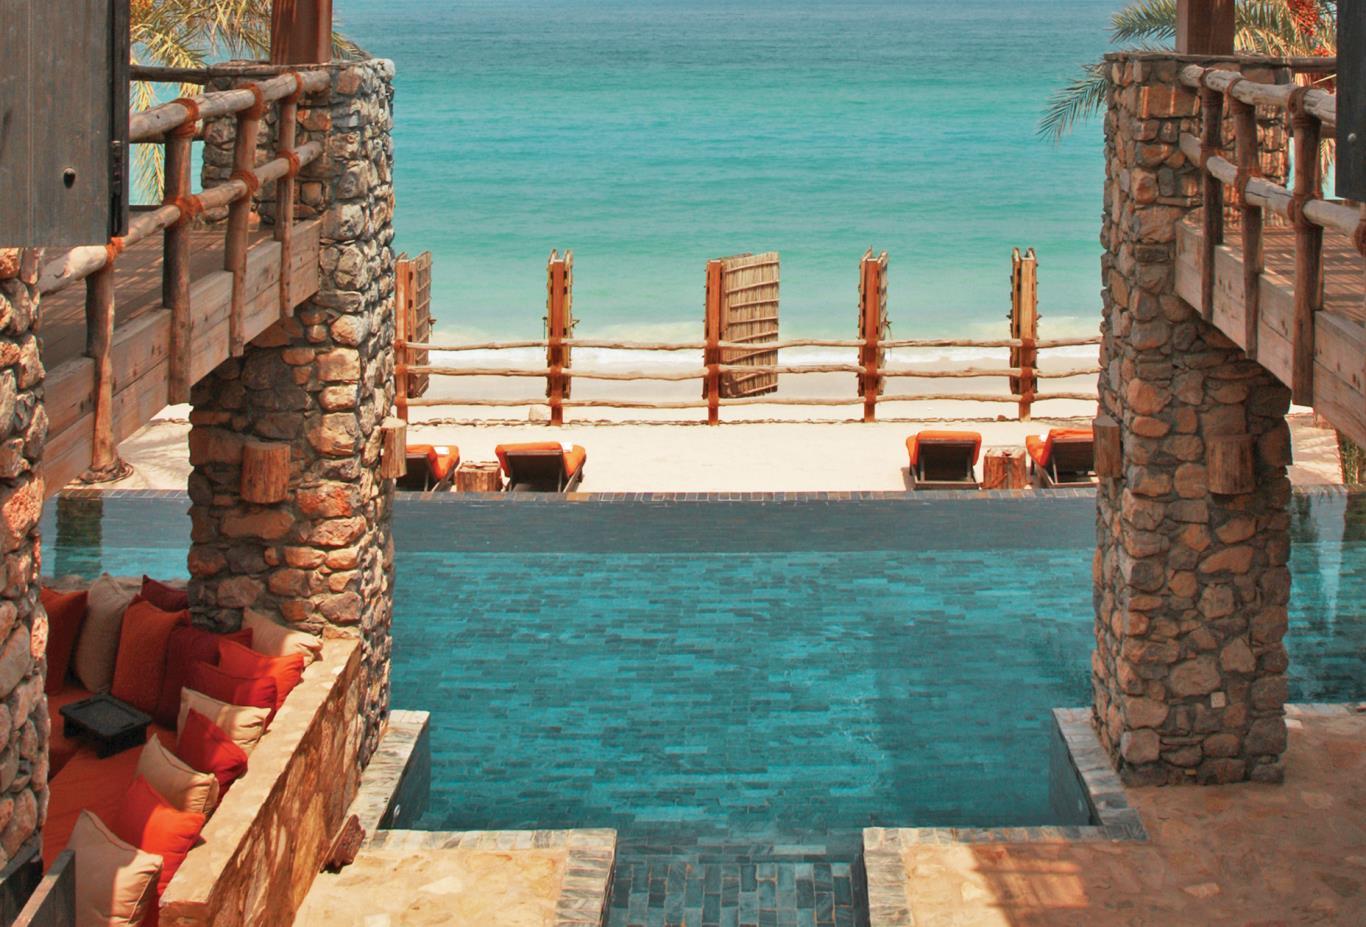 Two Bedroom Beachfront Retreat pool view